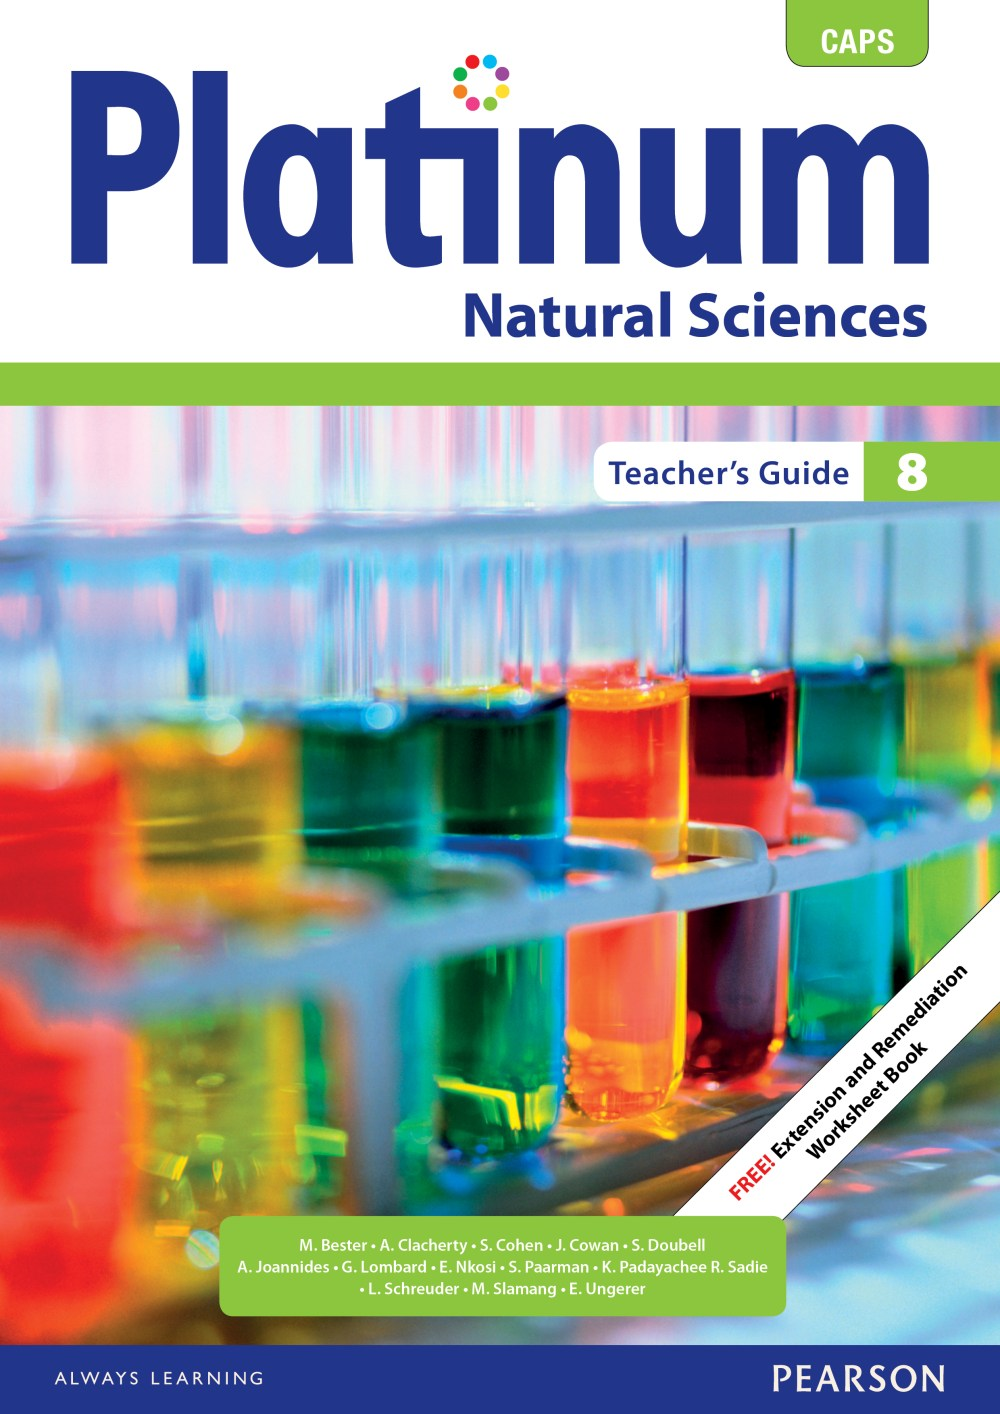 medium resolution of Platinum Natural Sciences Grade 8 Teacher's Guide ePDF (1-year licence)    WCED ePortal